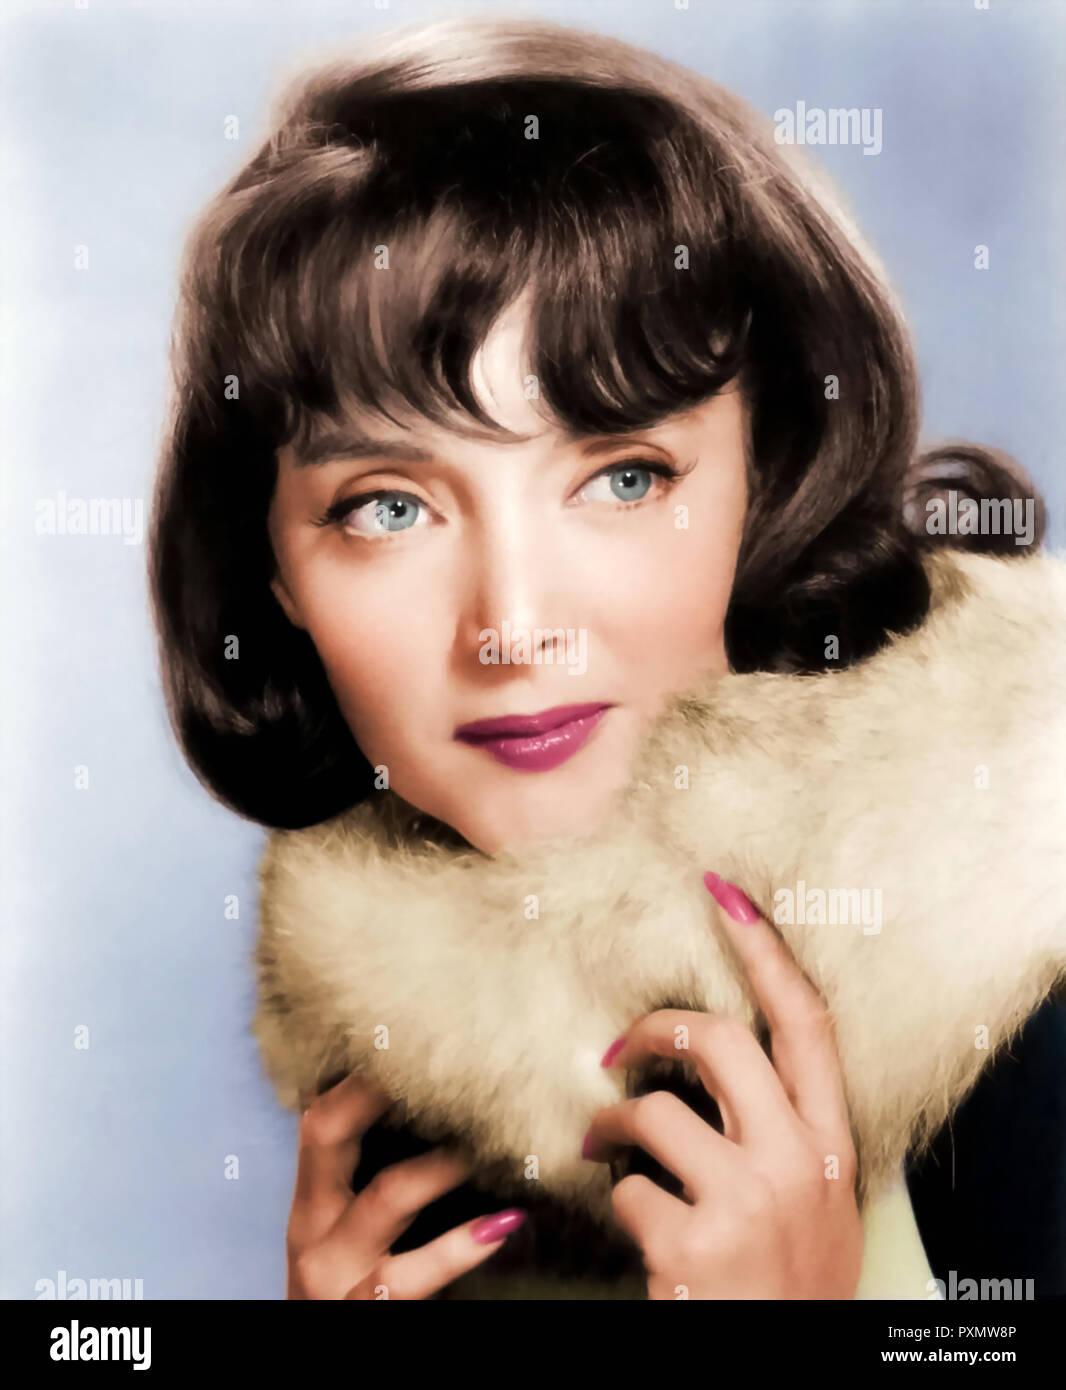 CAROLYN JONES (1930-1983), US-amerikanische Schauspielerin ungefähr 1955 Stockbild